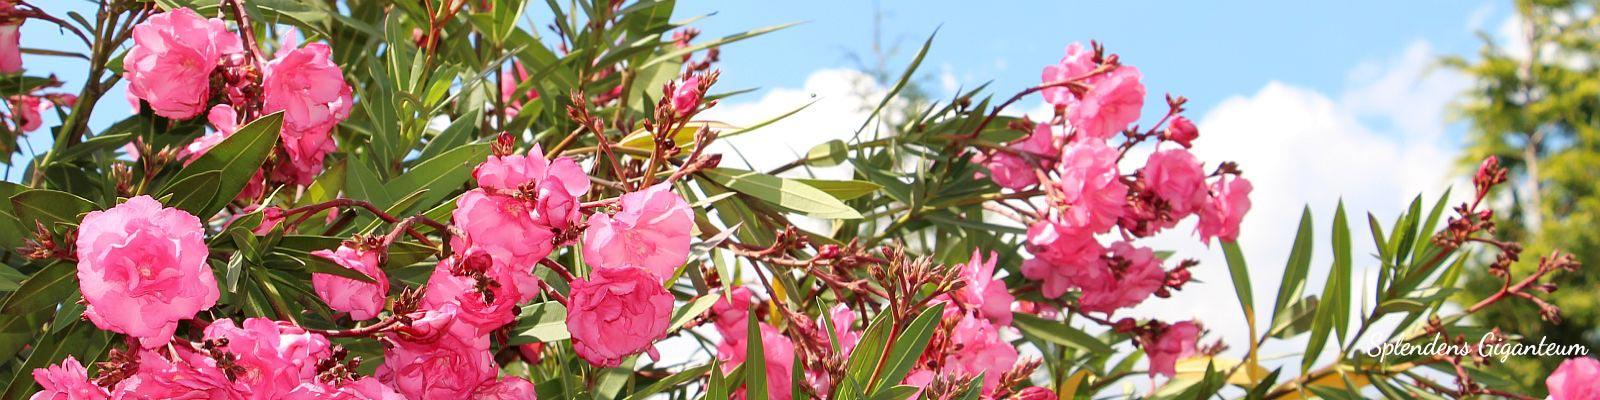 Über unsere Oleander